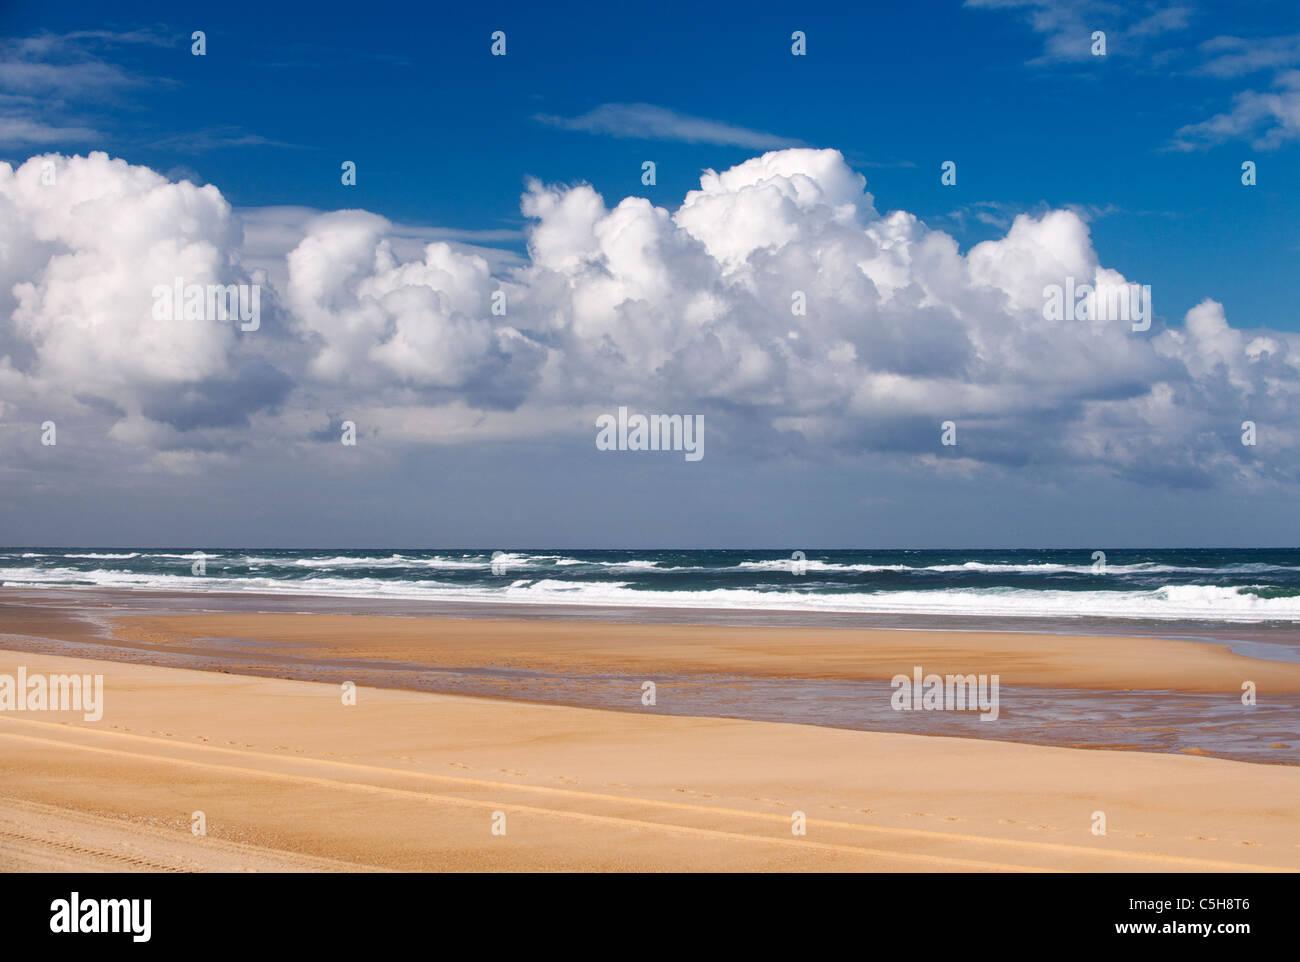 Soustons Plage, Landes, Aquitaine, France Photo Stock